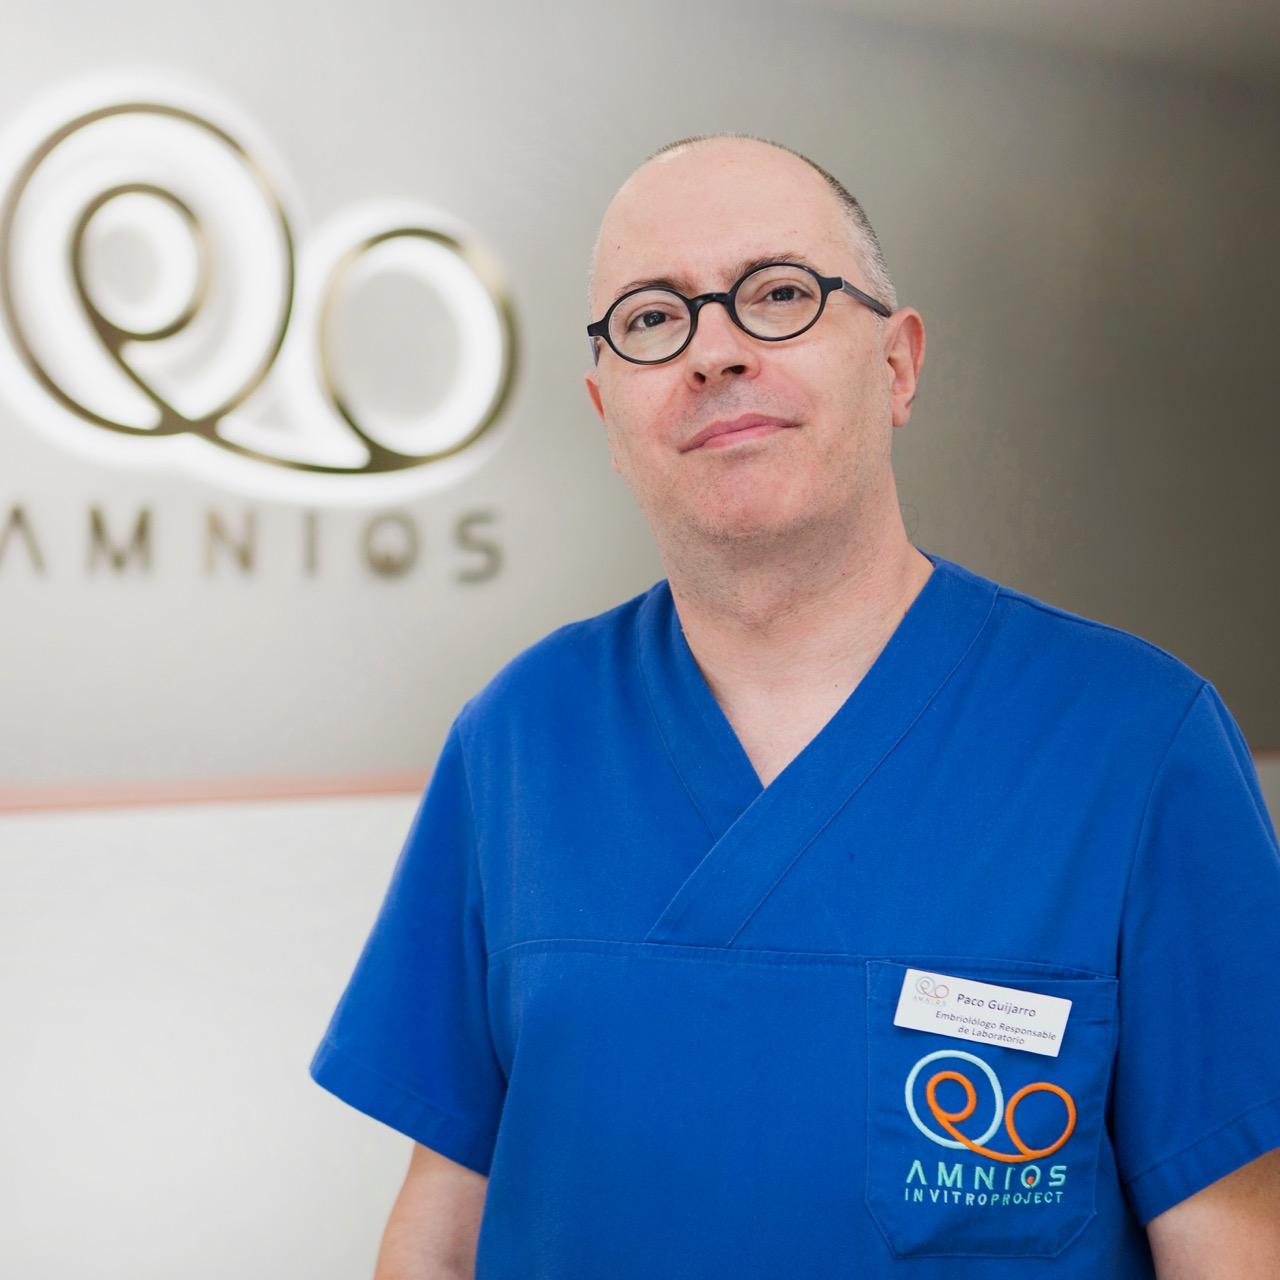 Dr. Paco Guijarro - Clínica Amnios In Vitro Project